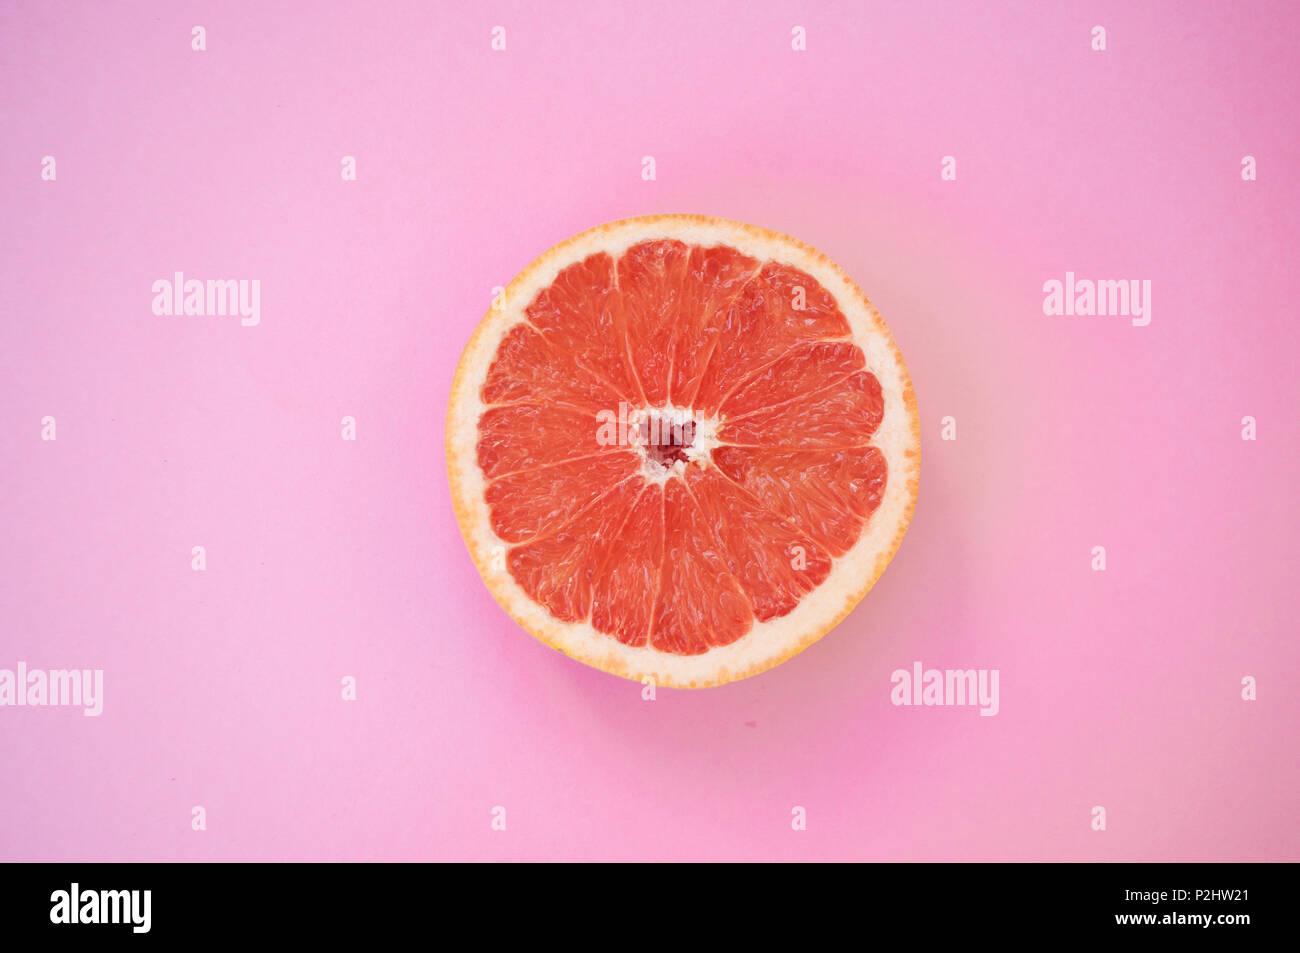 Beautiful juicy cut grapefruit on pastel pink background. Stock Photo